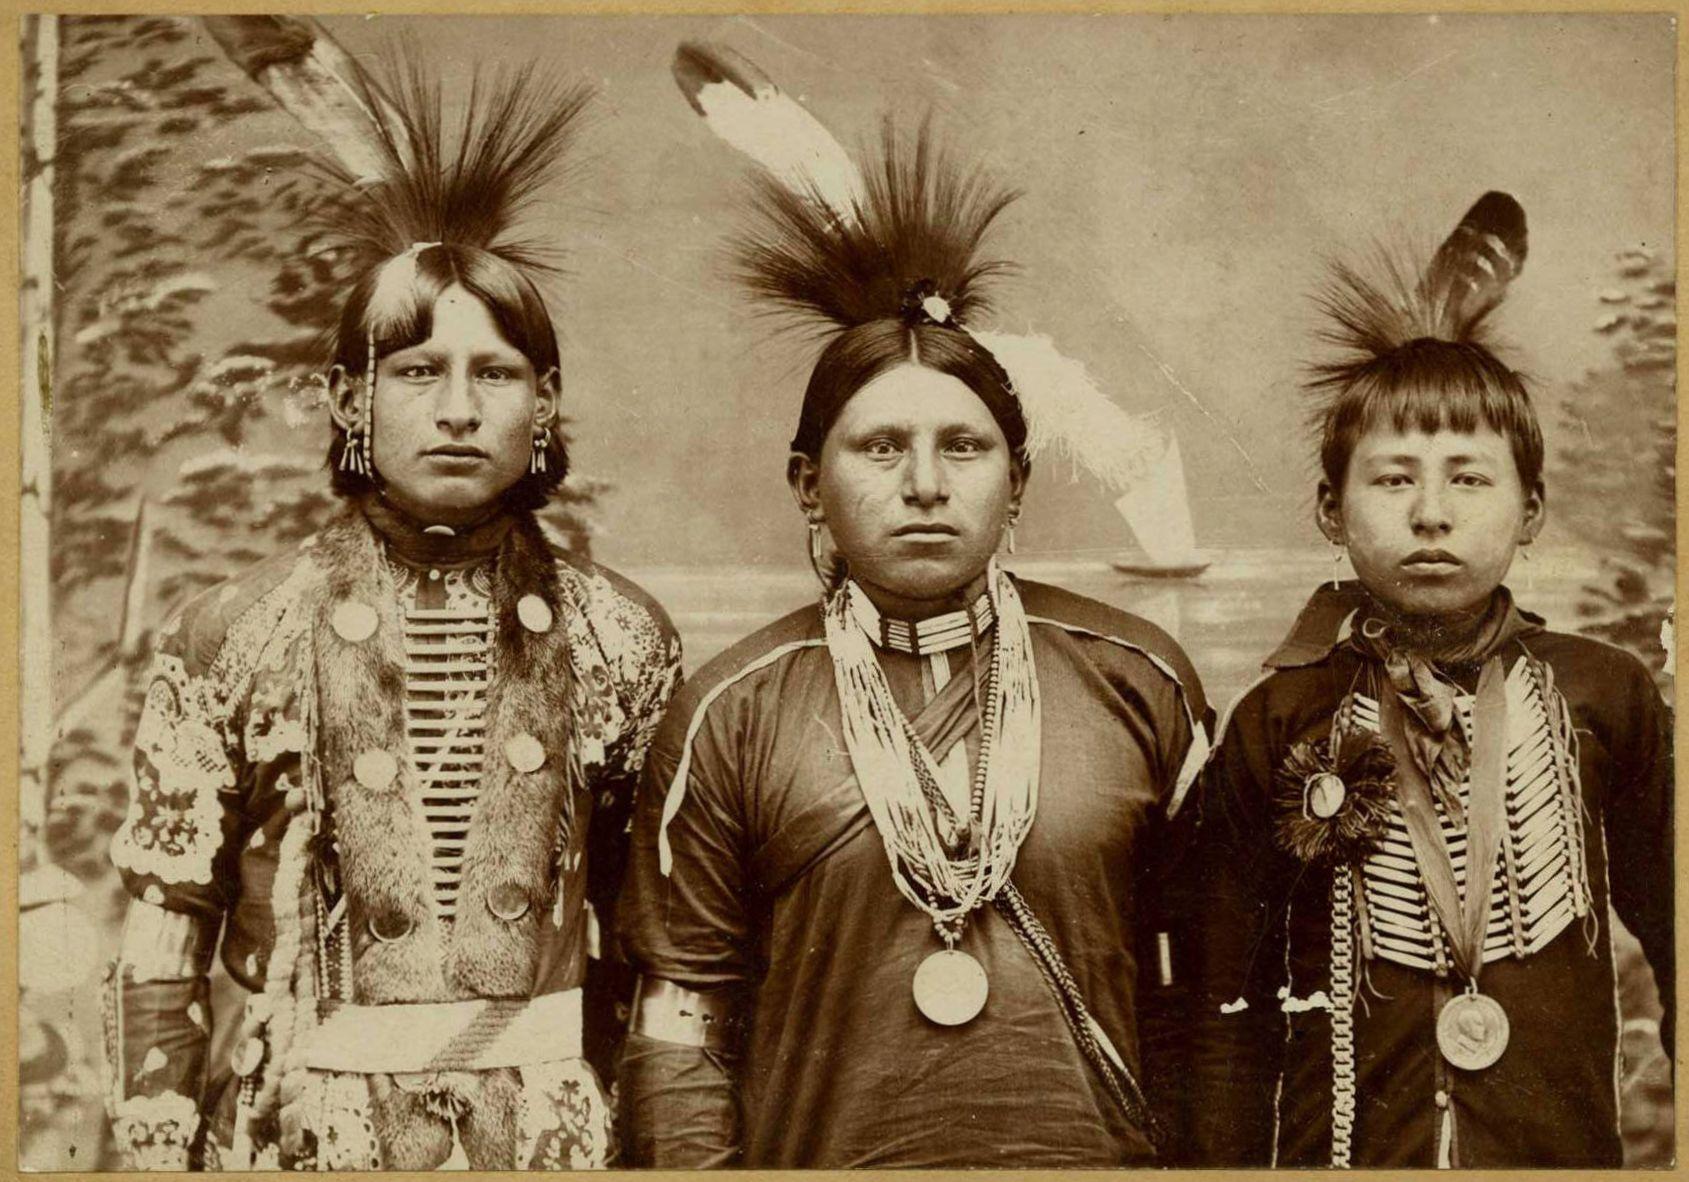 Indijanci na fotografiji i slici - Page 2 Three_young_native_american_men